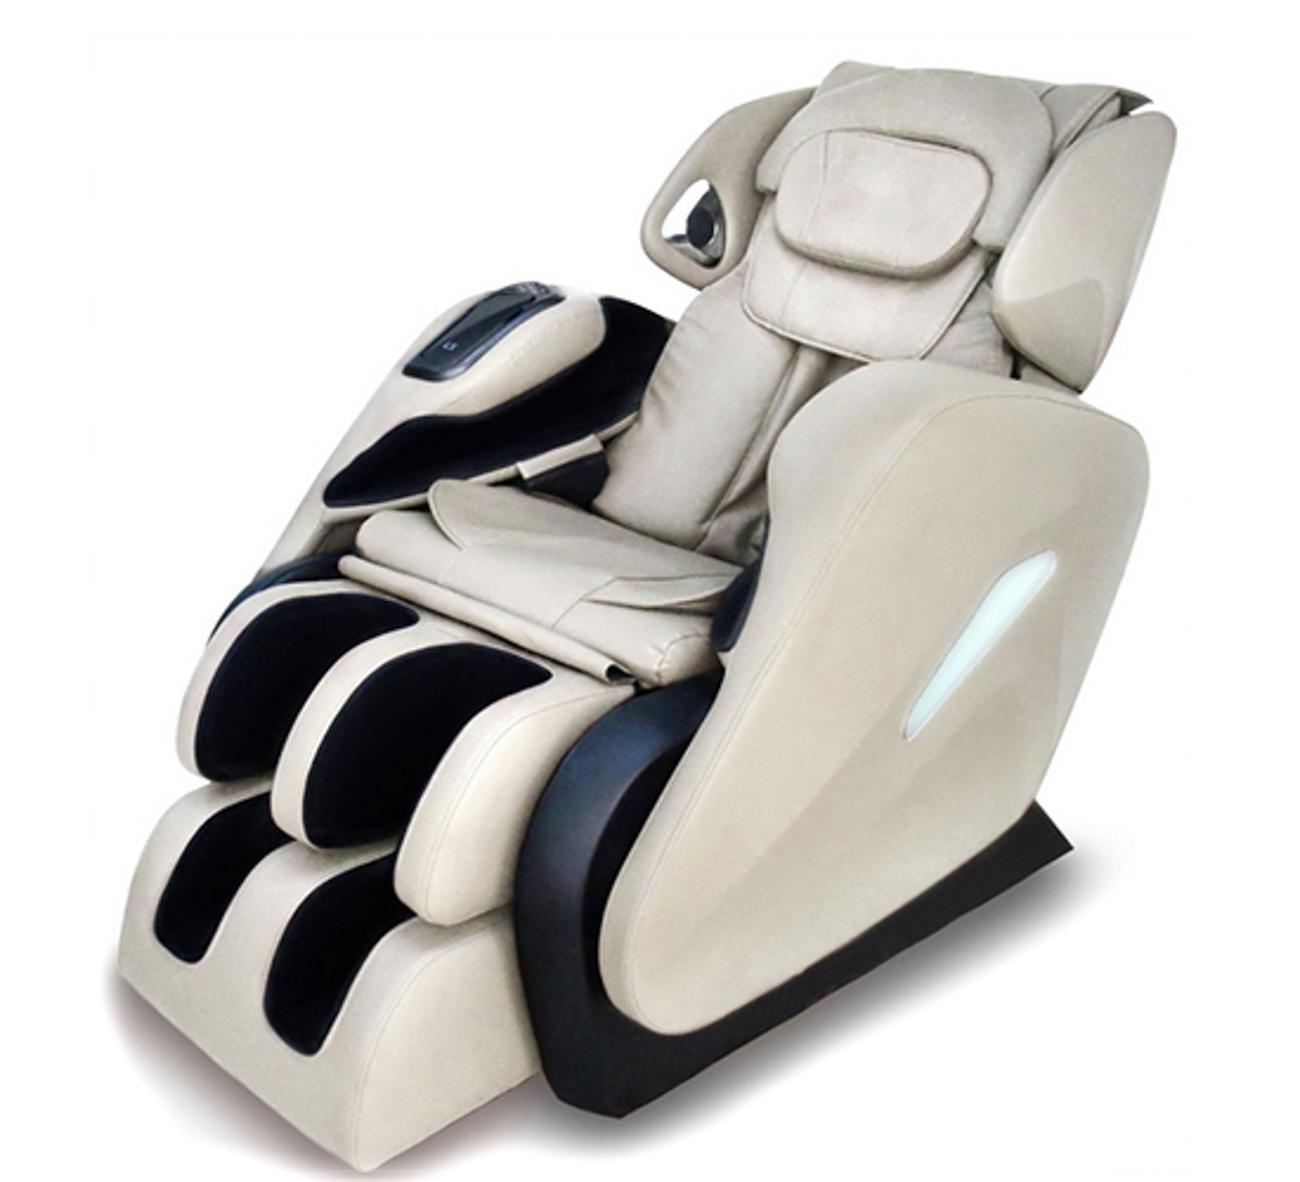 Osaki OS-3D Pro Marquis Zero Gravity Massage Chair Ivory